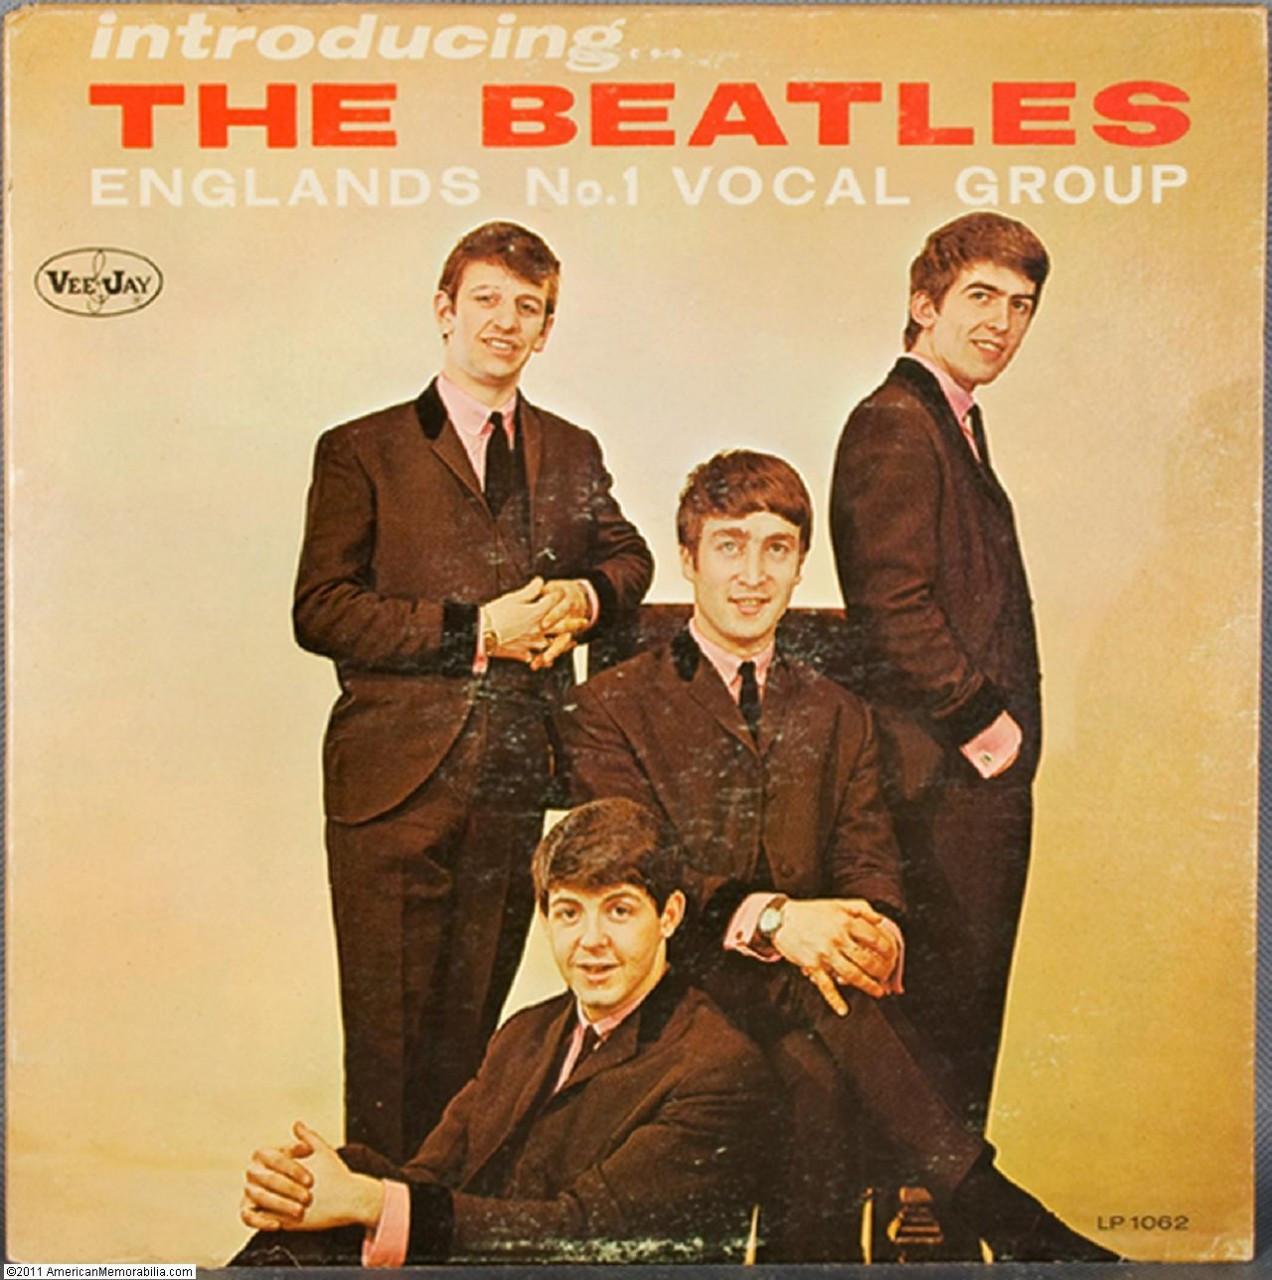 Introducing The Beatles [Vinyl] - '80s Vee-Jay Reissue, Black Label